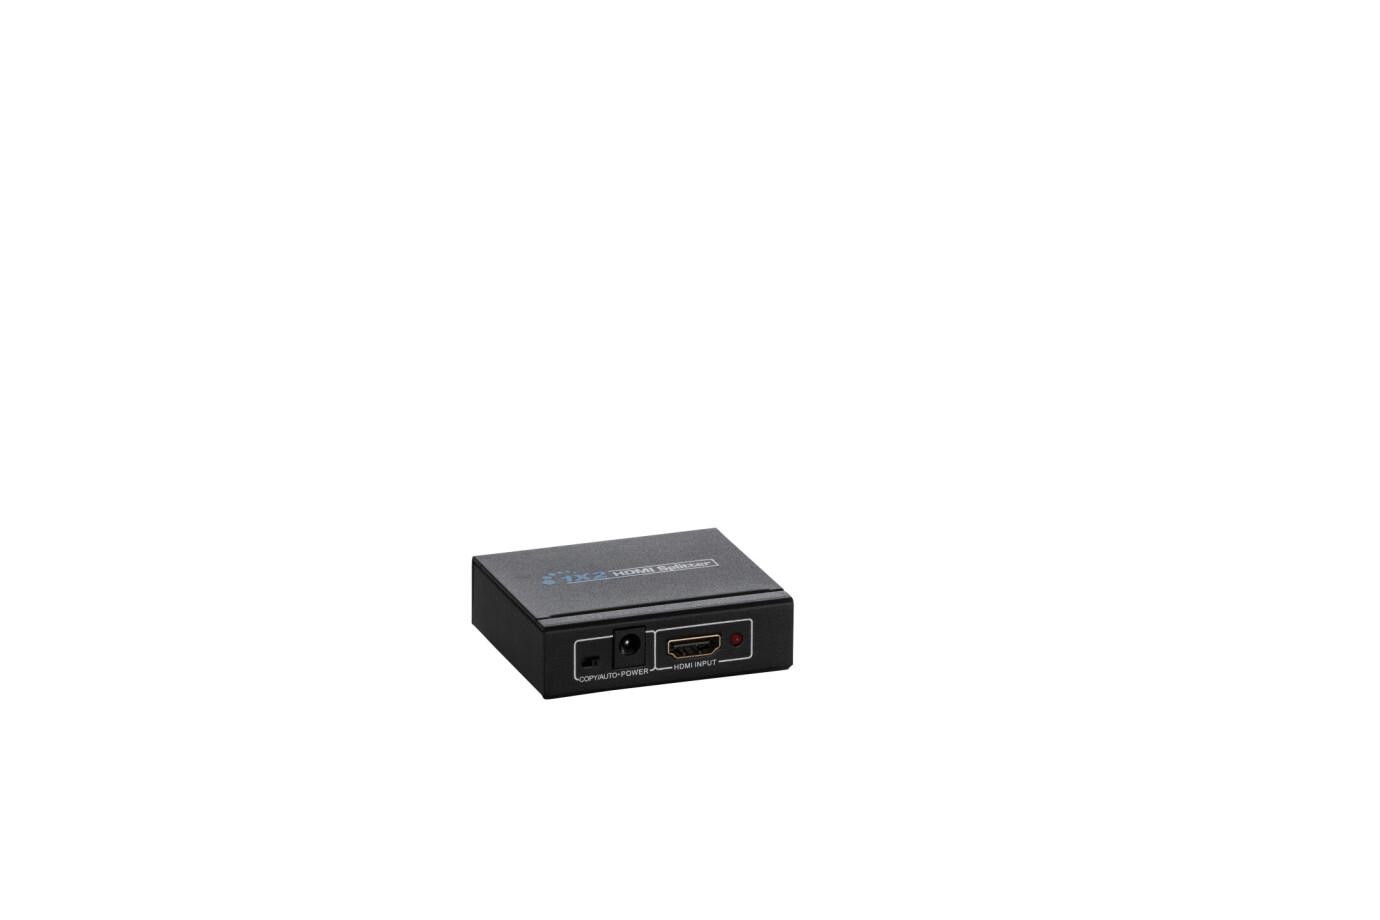 Celexon Expert HDMI Splitter 1X2 EDID